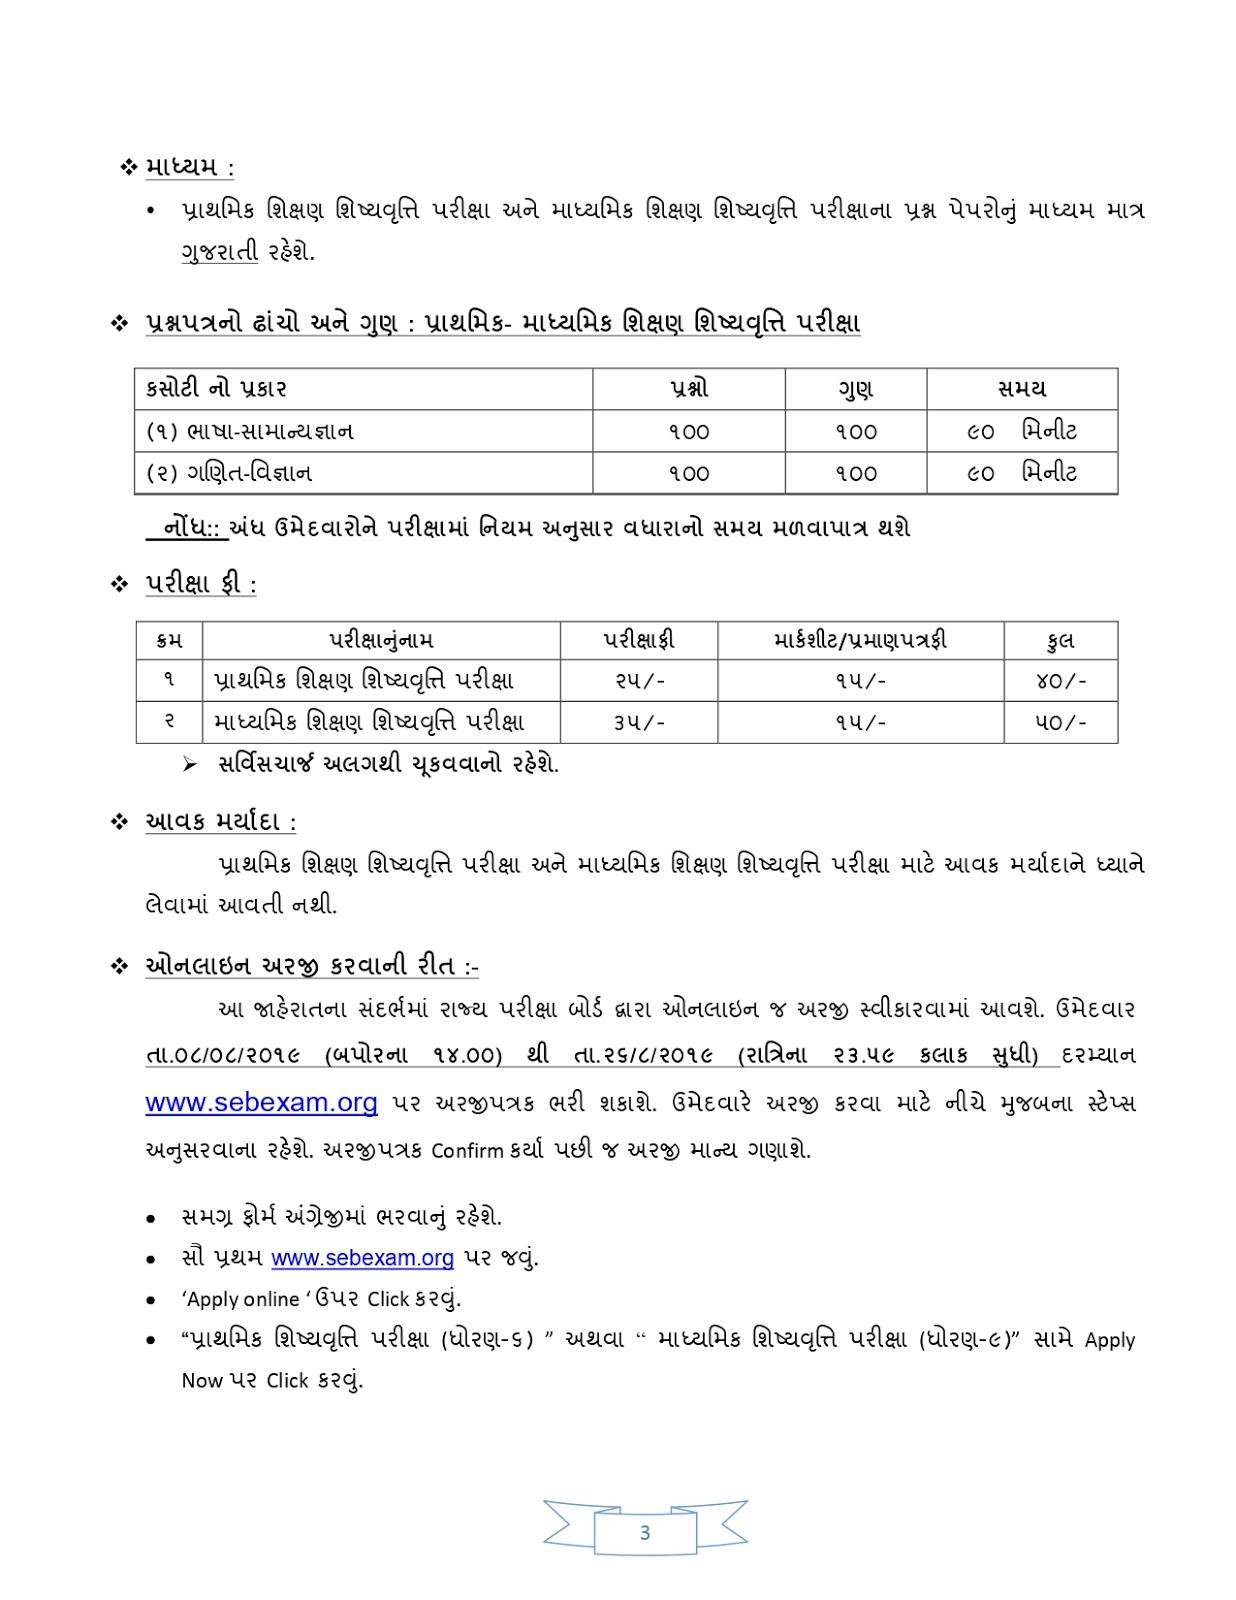 SEB Primary-Secondary Scholarship Exam 2019